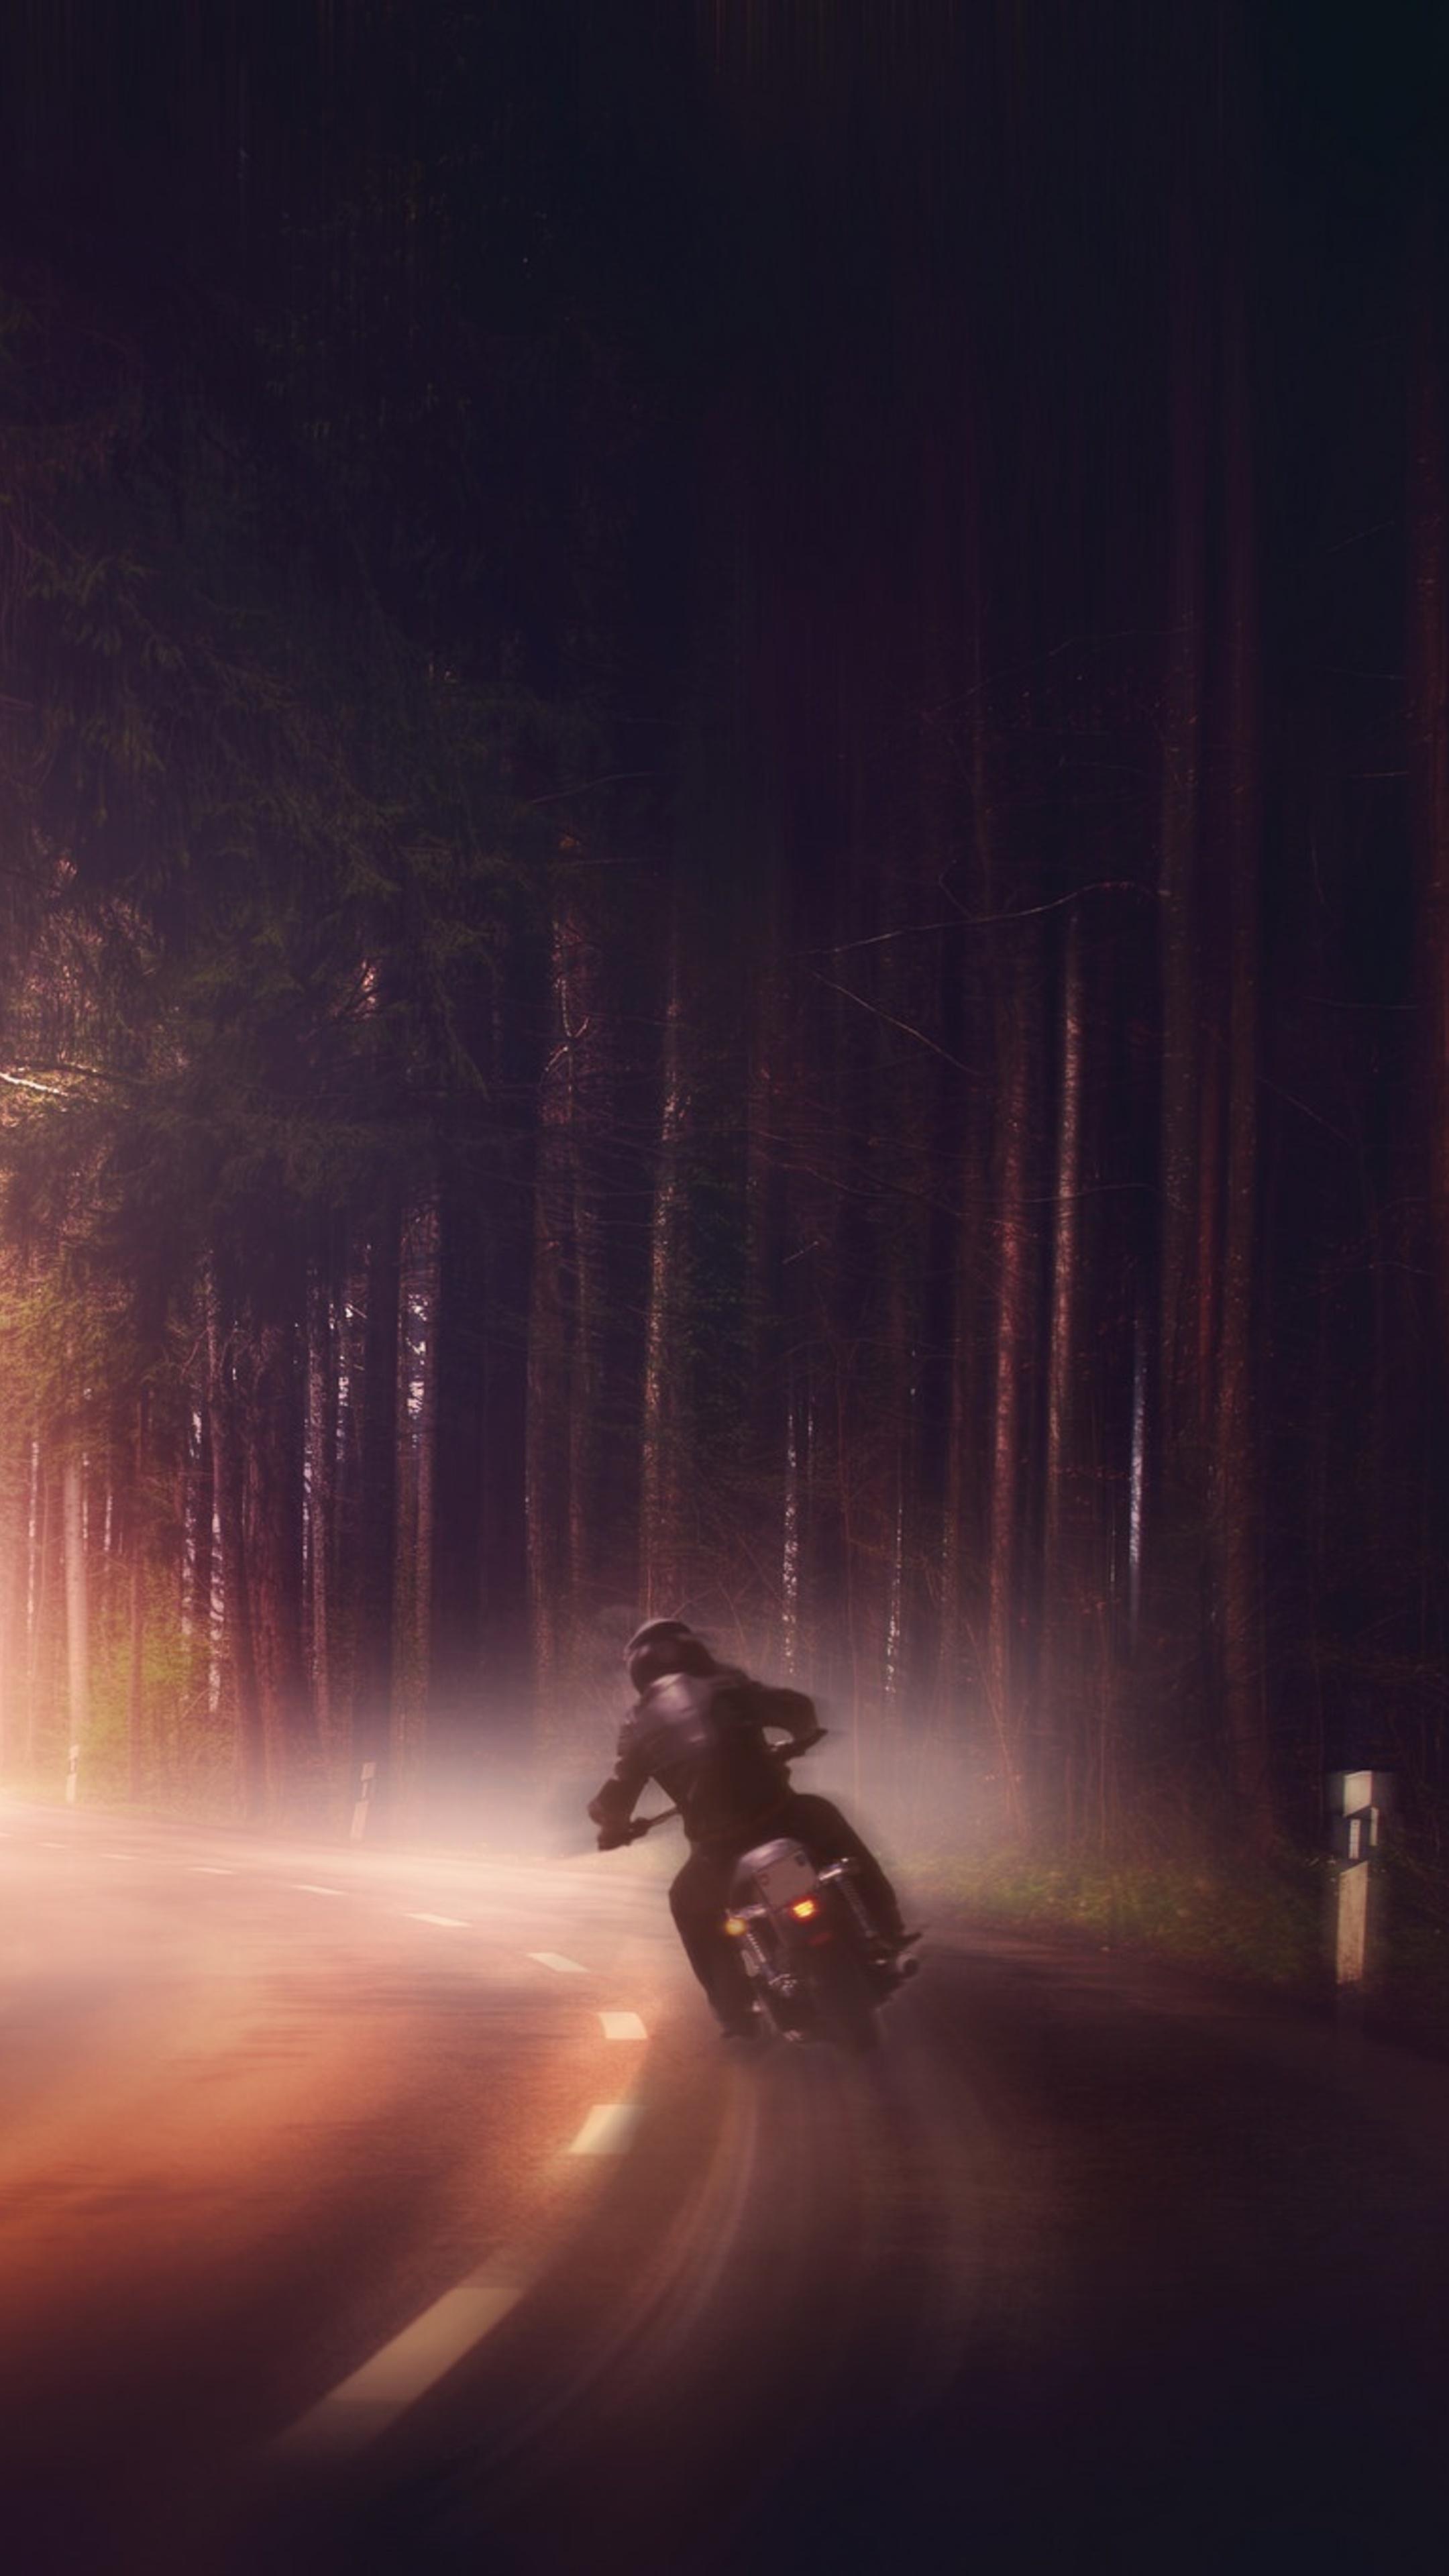 2160x3840 biker in woods dark road digital art sony xperia - Art wallpaper 2160x3840 ...